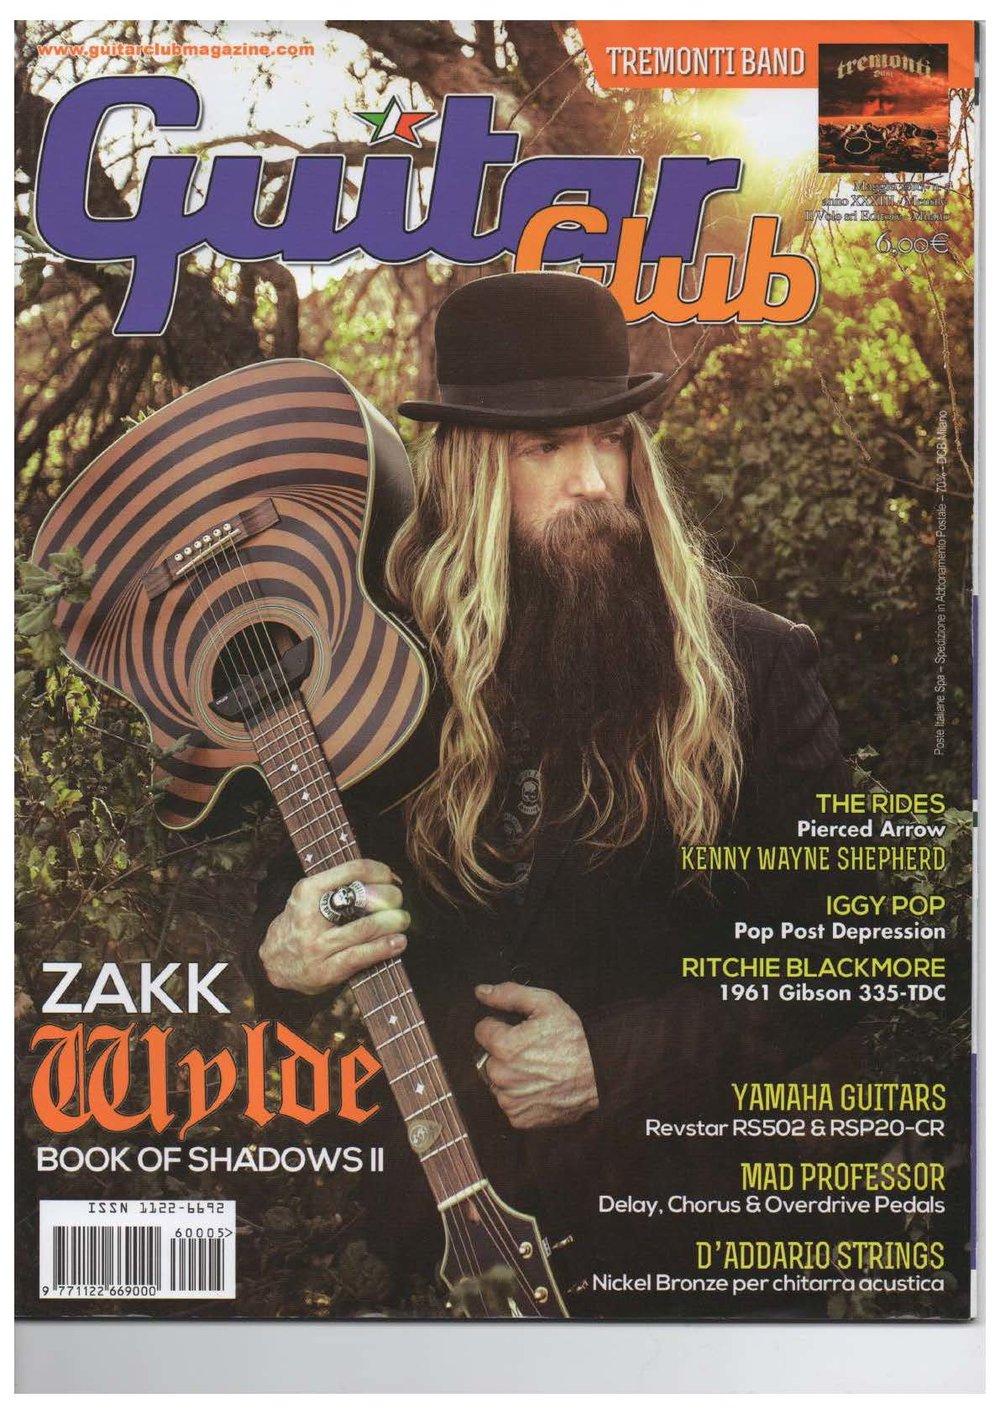 GuitarClub-maggio-2016_Page_1.jpg